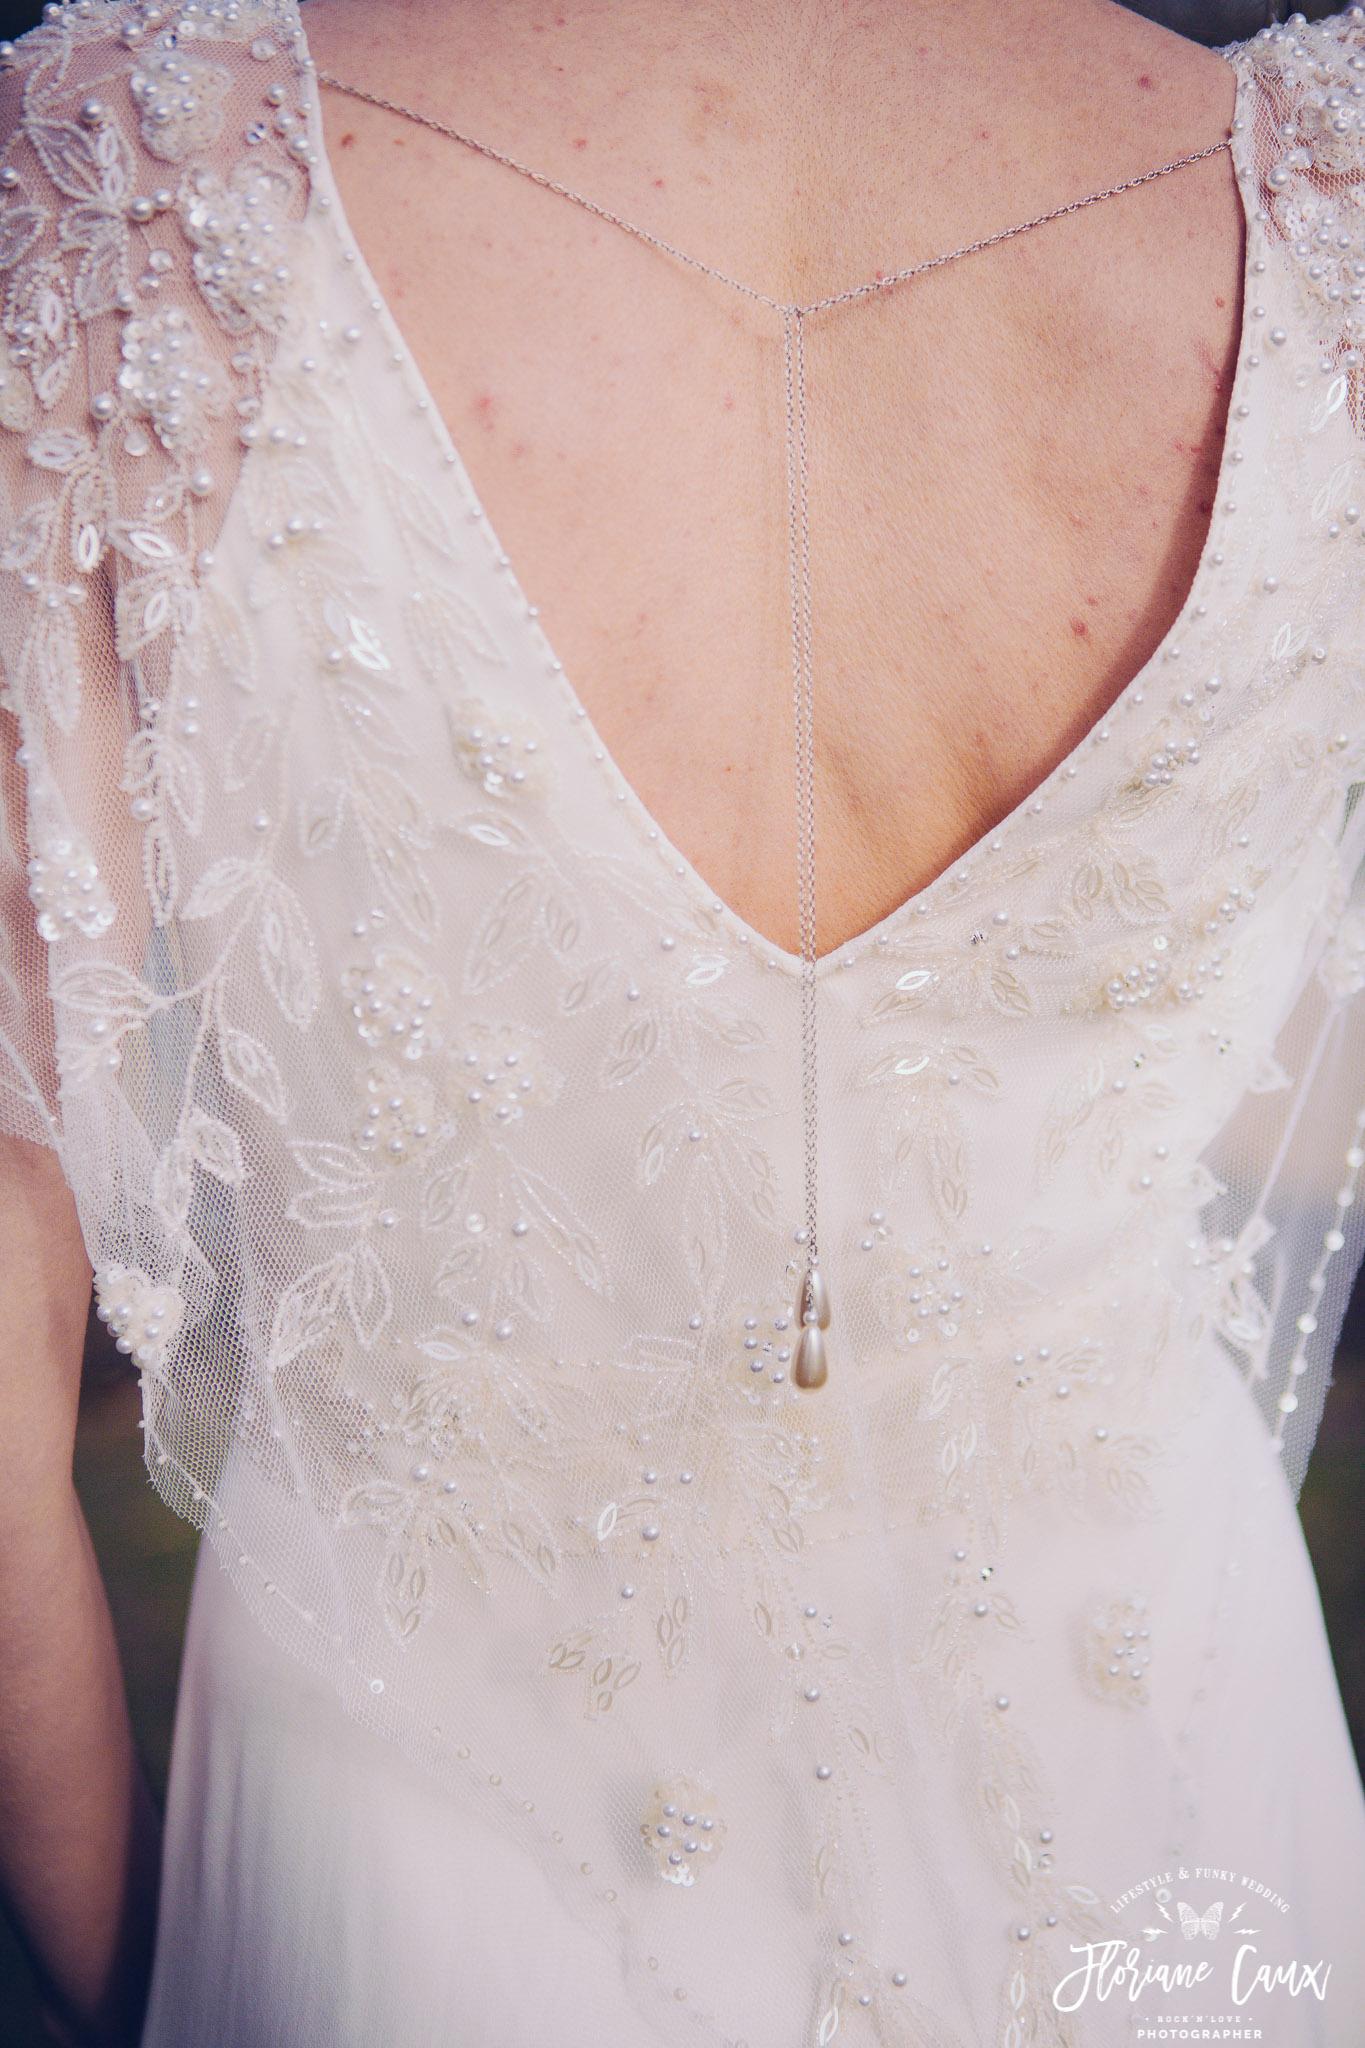 destination-wedding-photographer-oslo-norway-floriane-caux-79